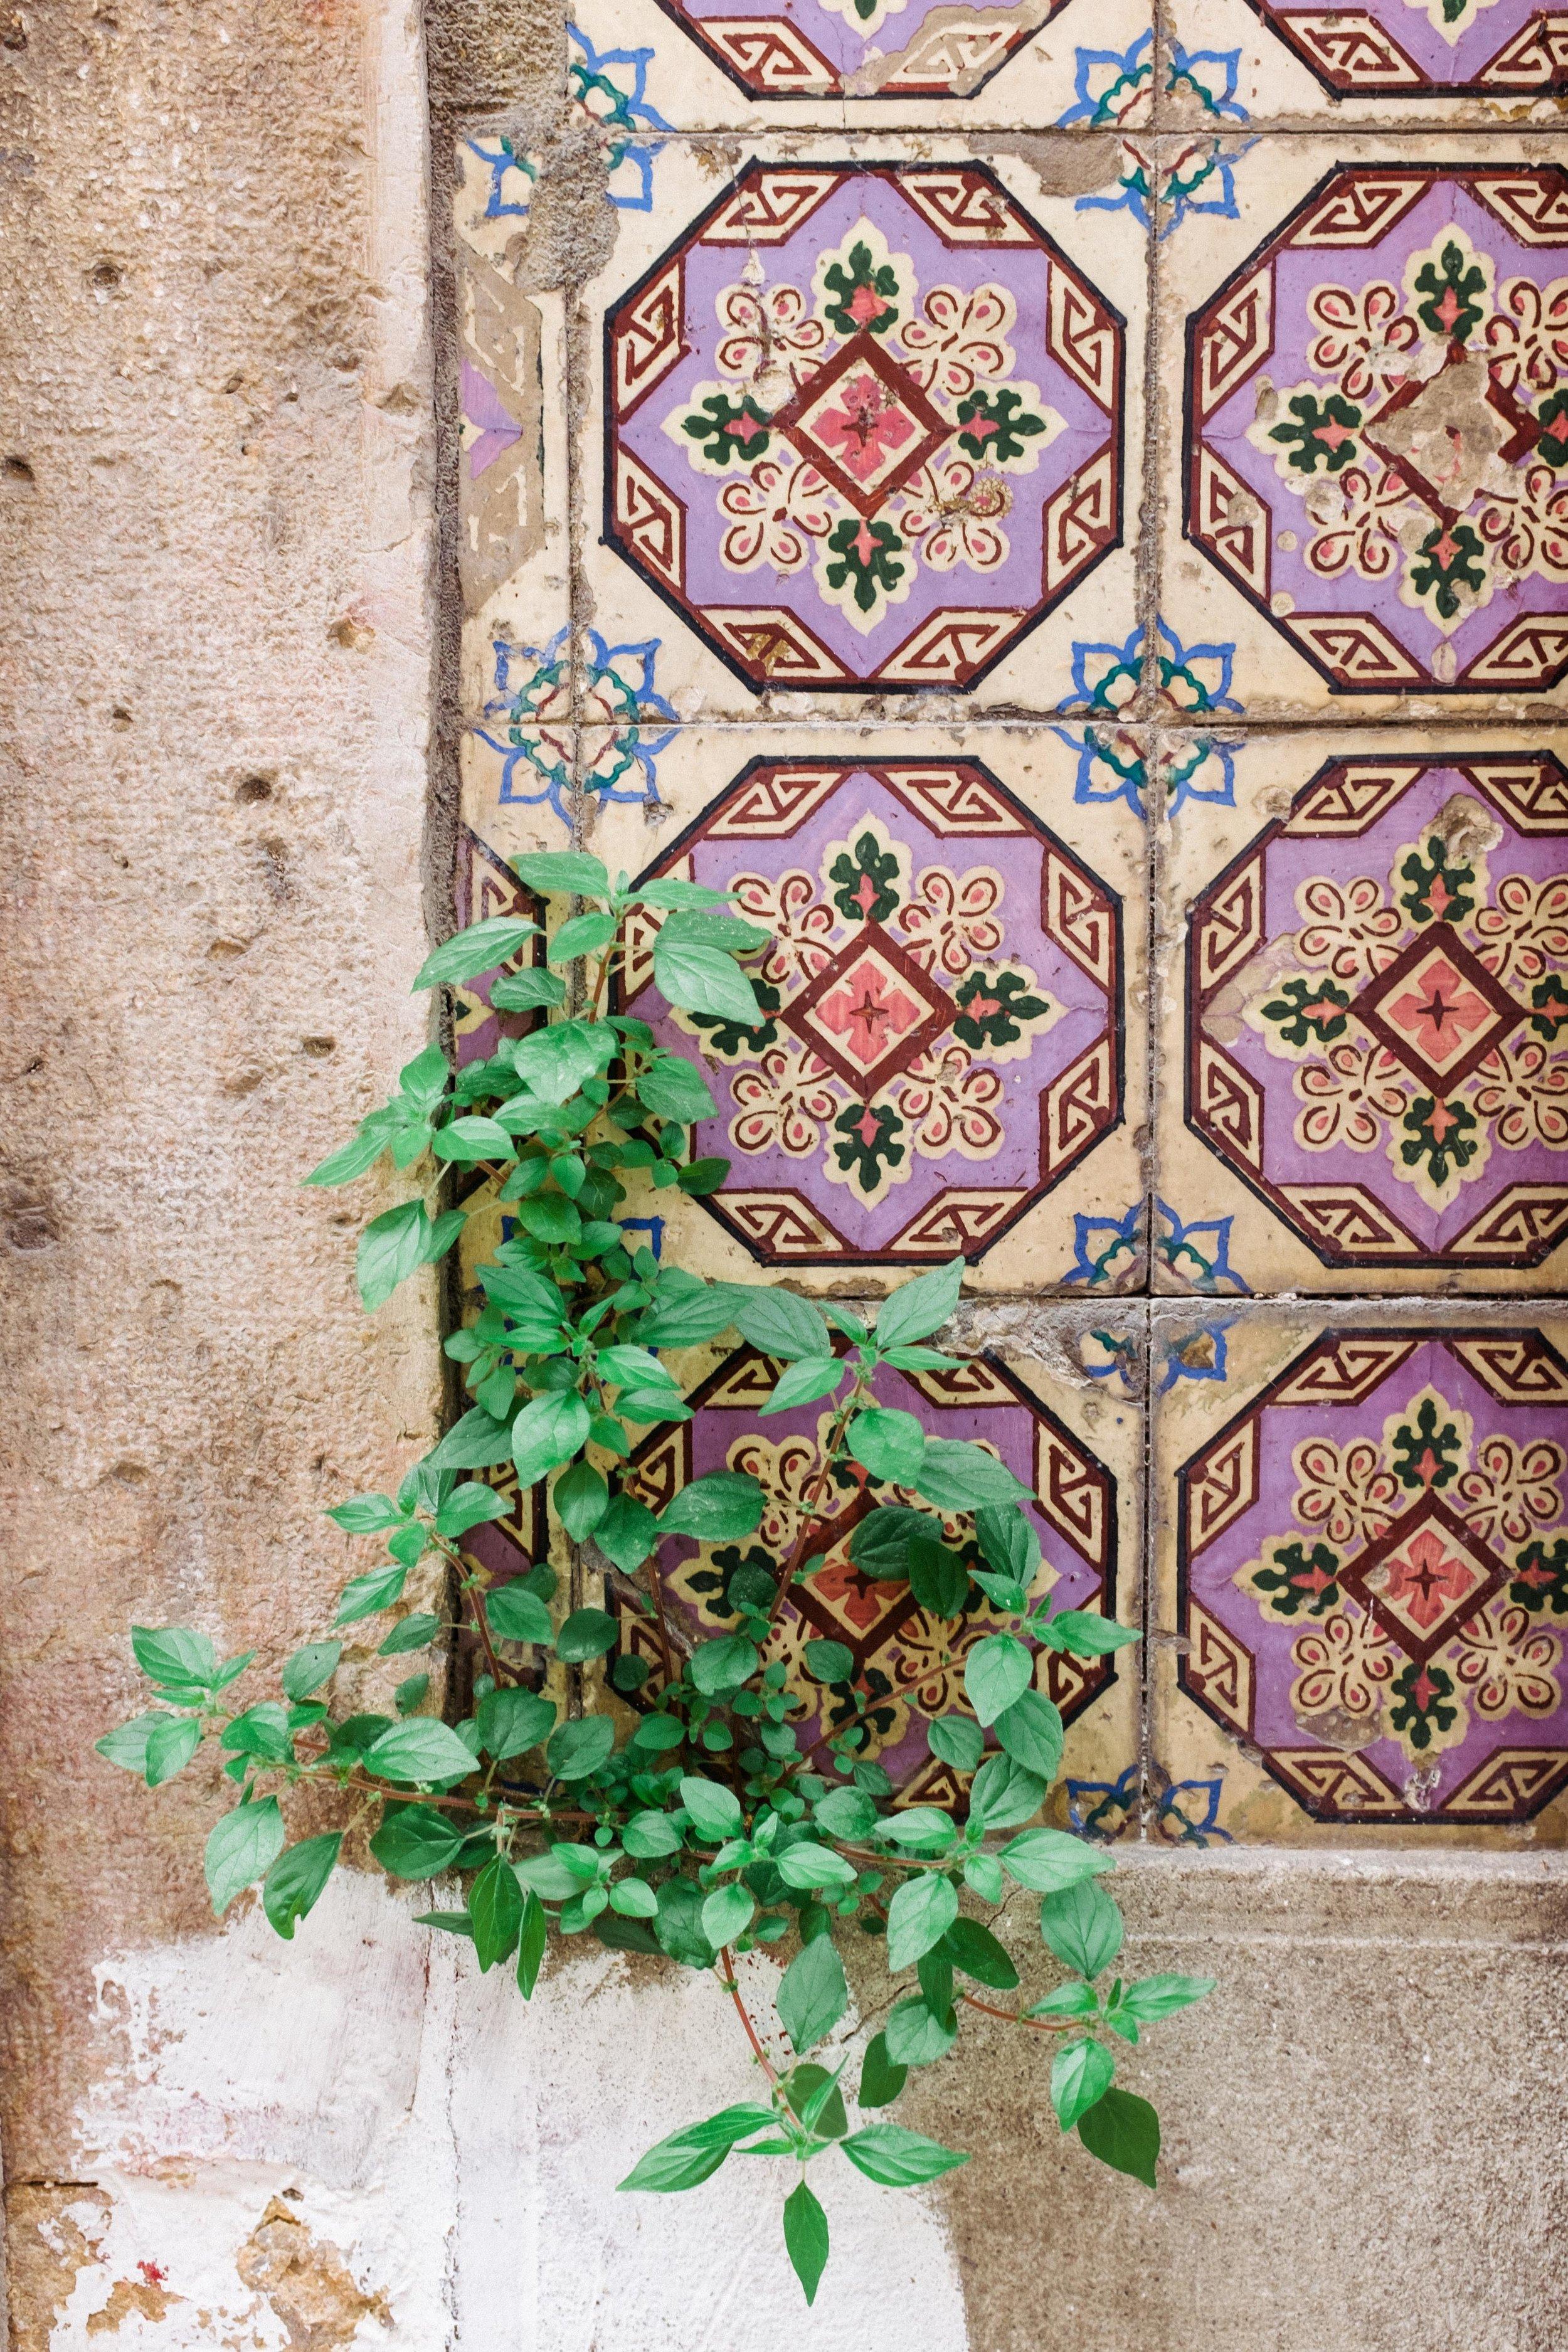 lisbon-portugal-azulejos-tiles-close-up